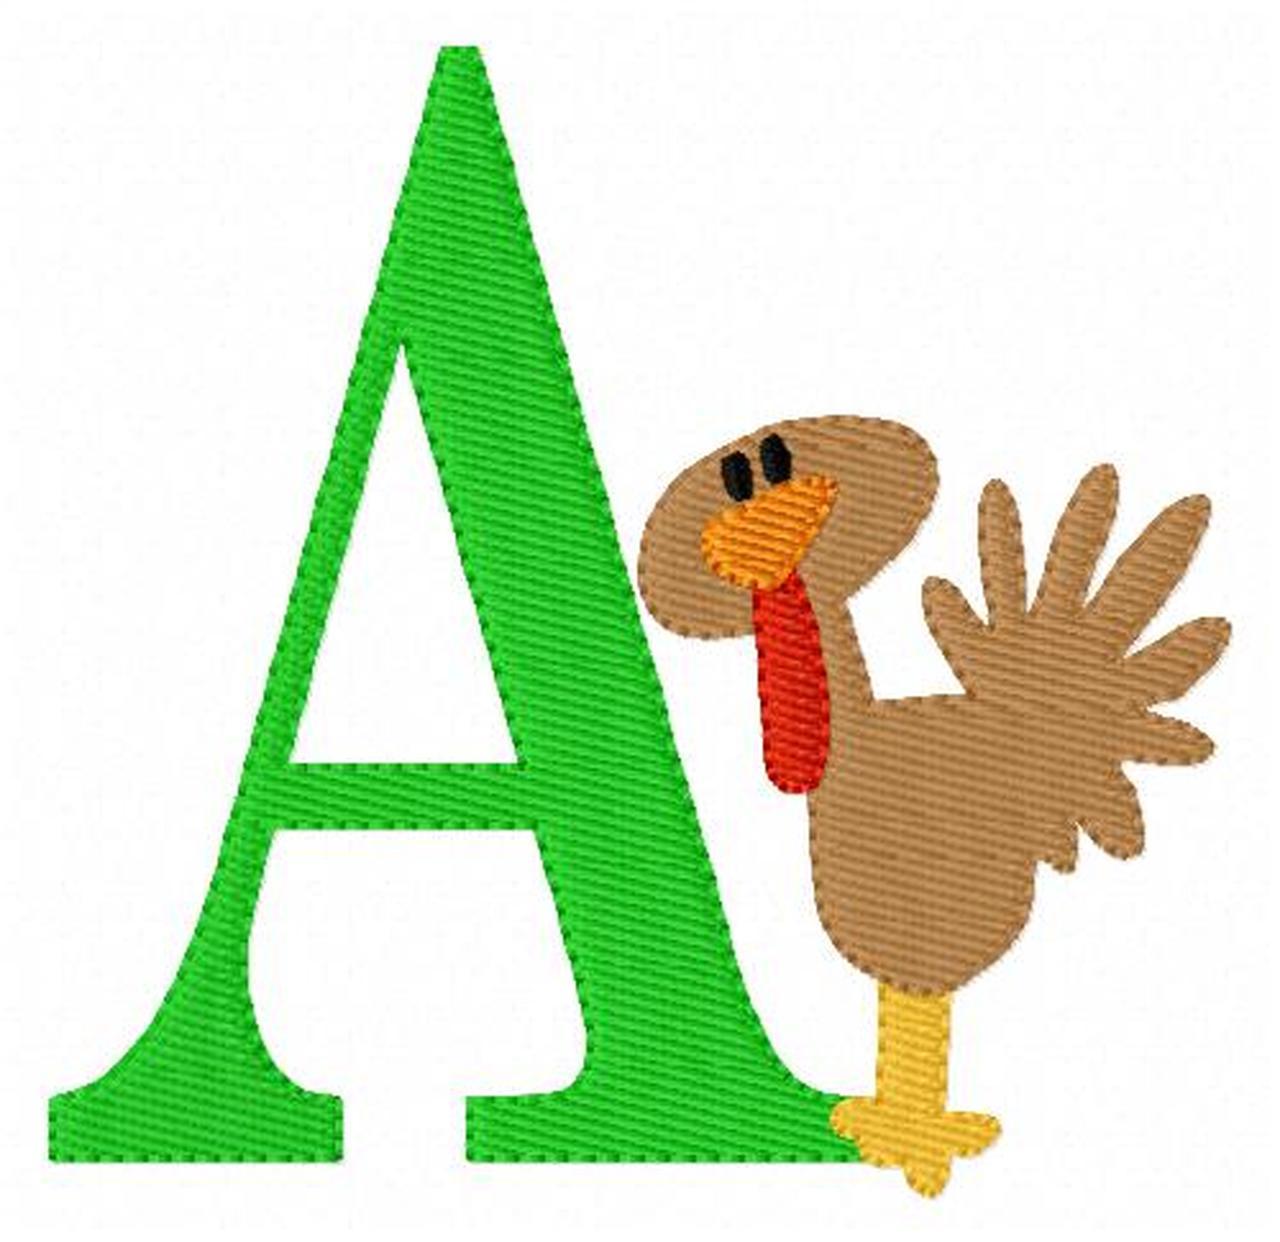 Thanksgiving Turkey Monogram Embroidery Font Design Set.